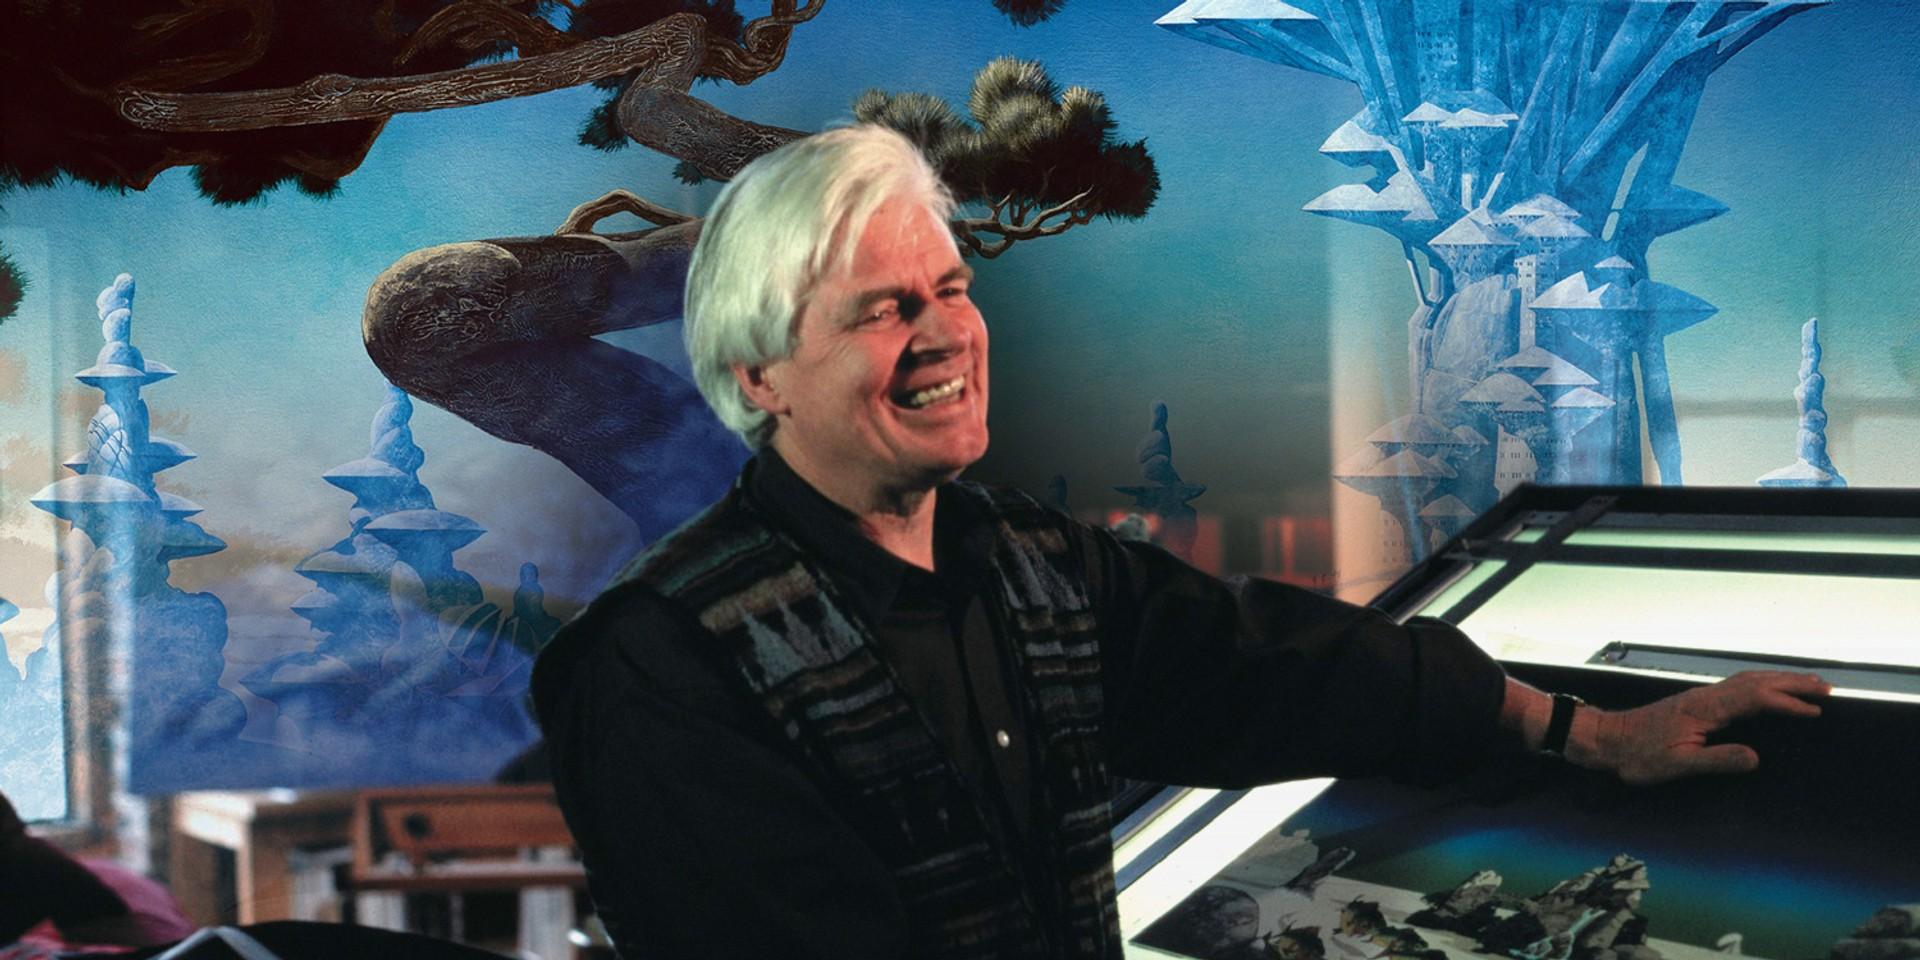 Veteran album artwork designer Roger Dean to showcase works in Singapore